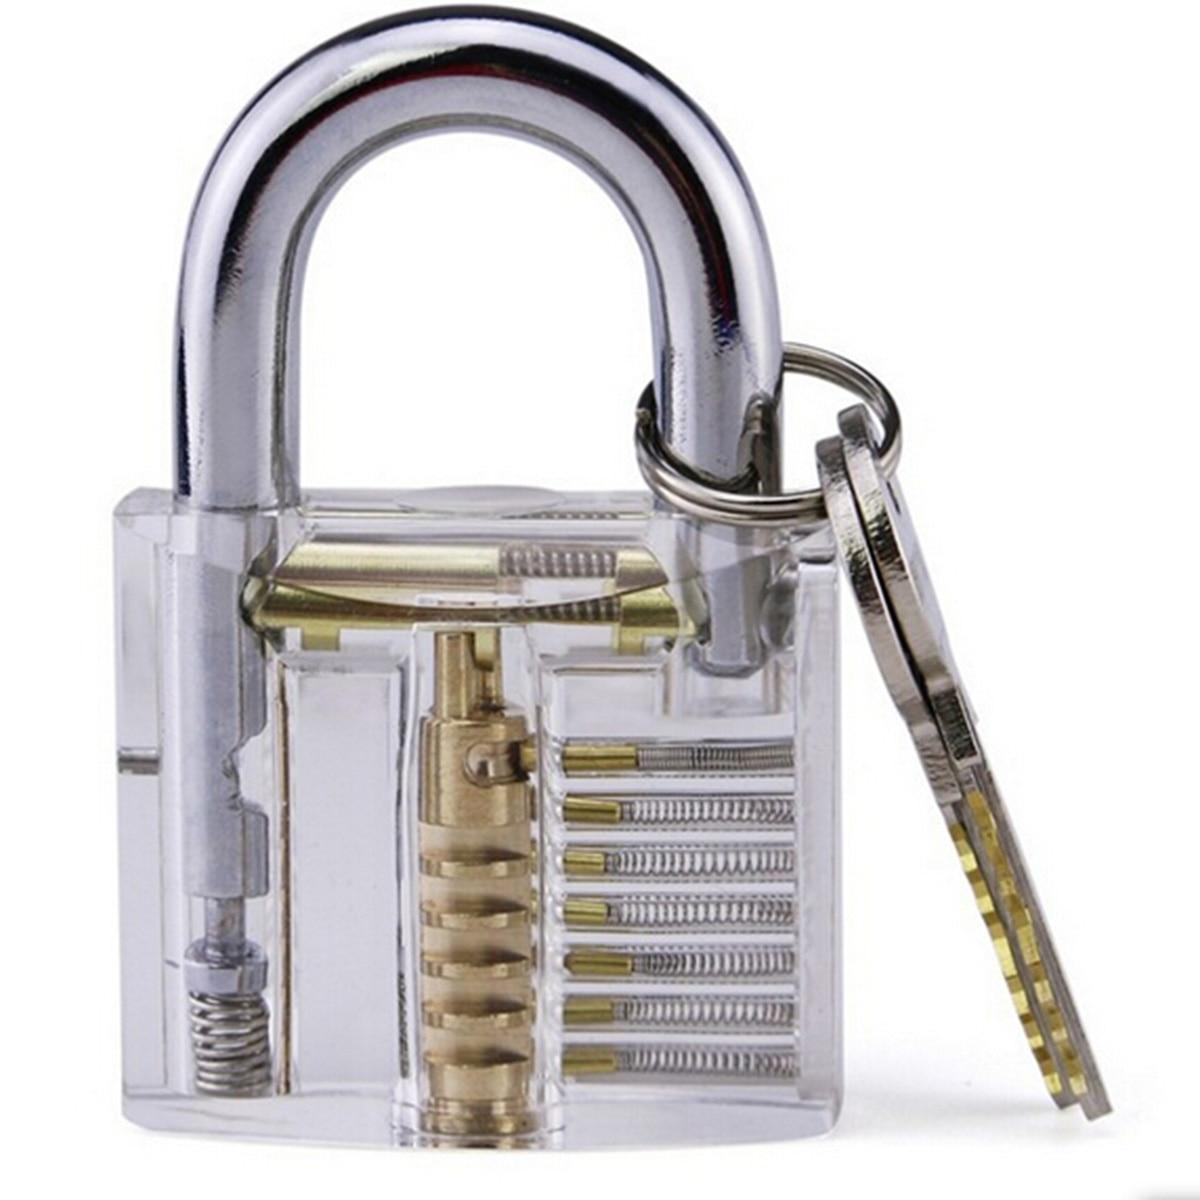 Transparent Visible Pick Cutaway Practice Padlock Lock With Broken Key Removing Hook Kit Extractor Set Locksmith Wrench Tool|Anti-theft Lock| |  - title=